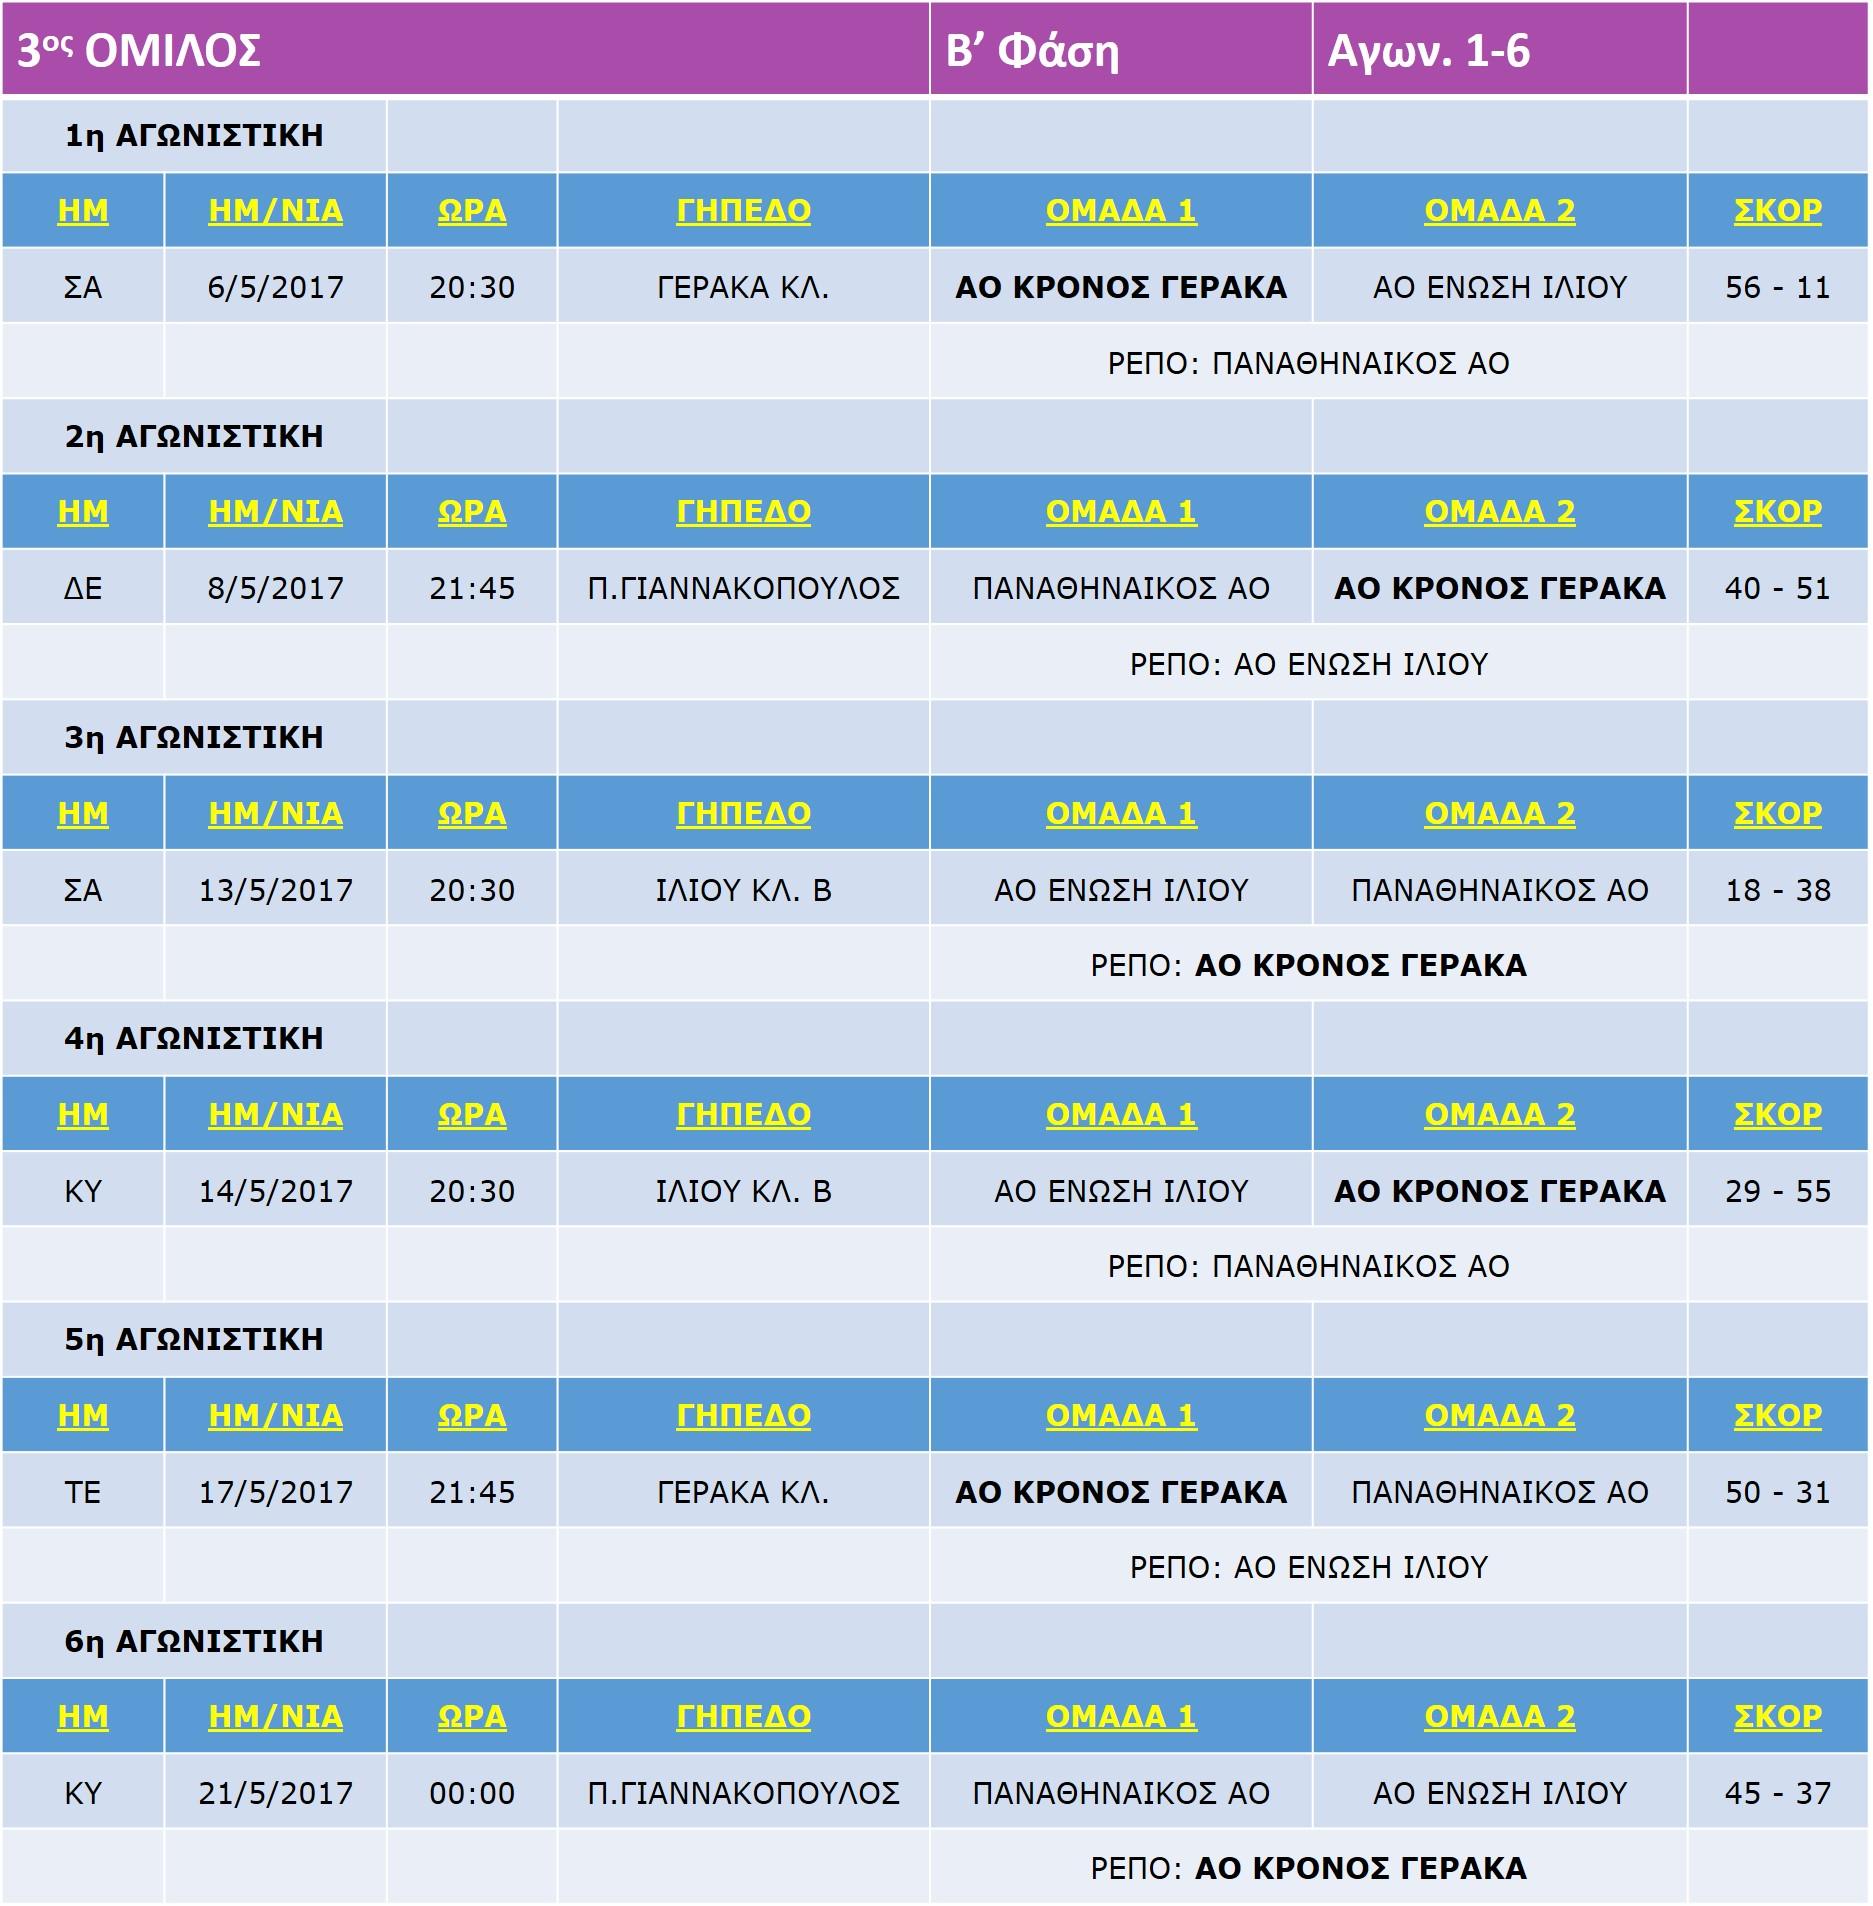 Pagkorasides_B_Match_1-6-6